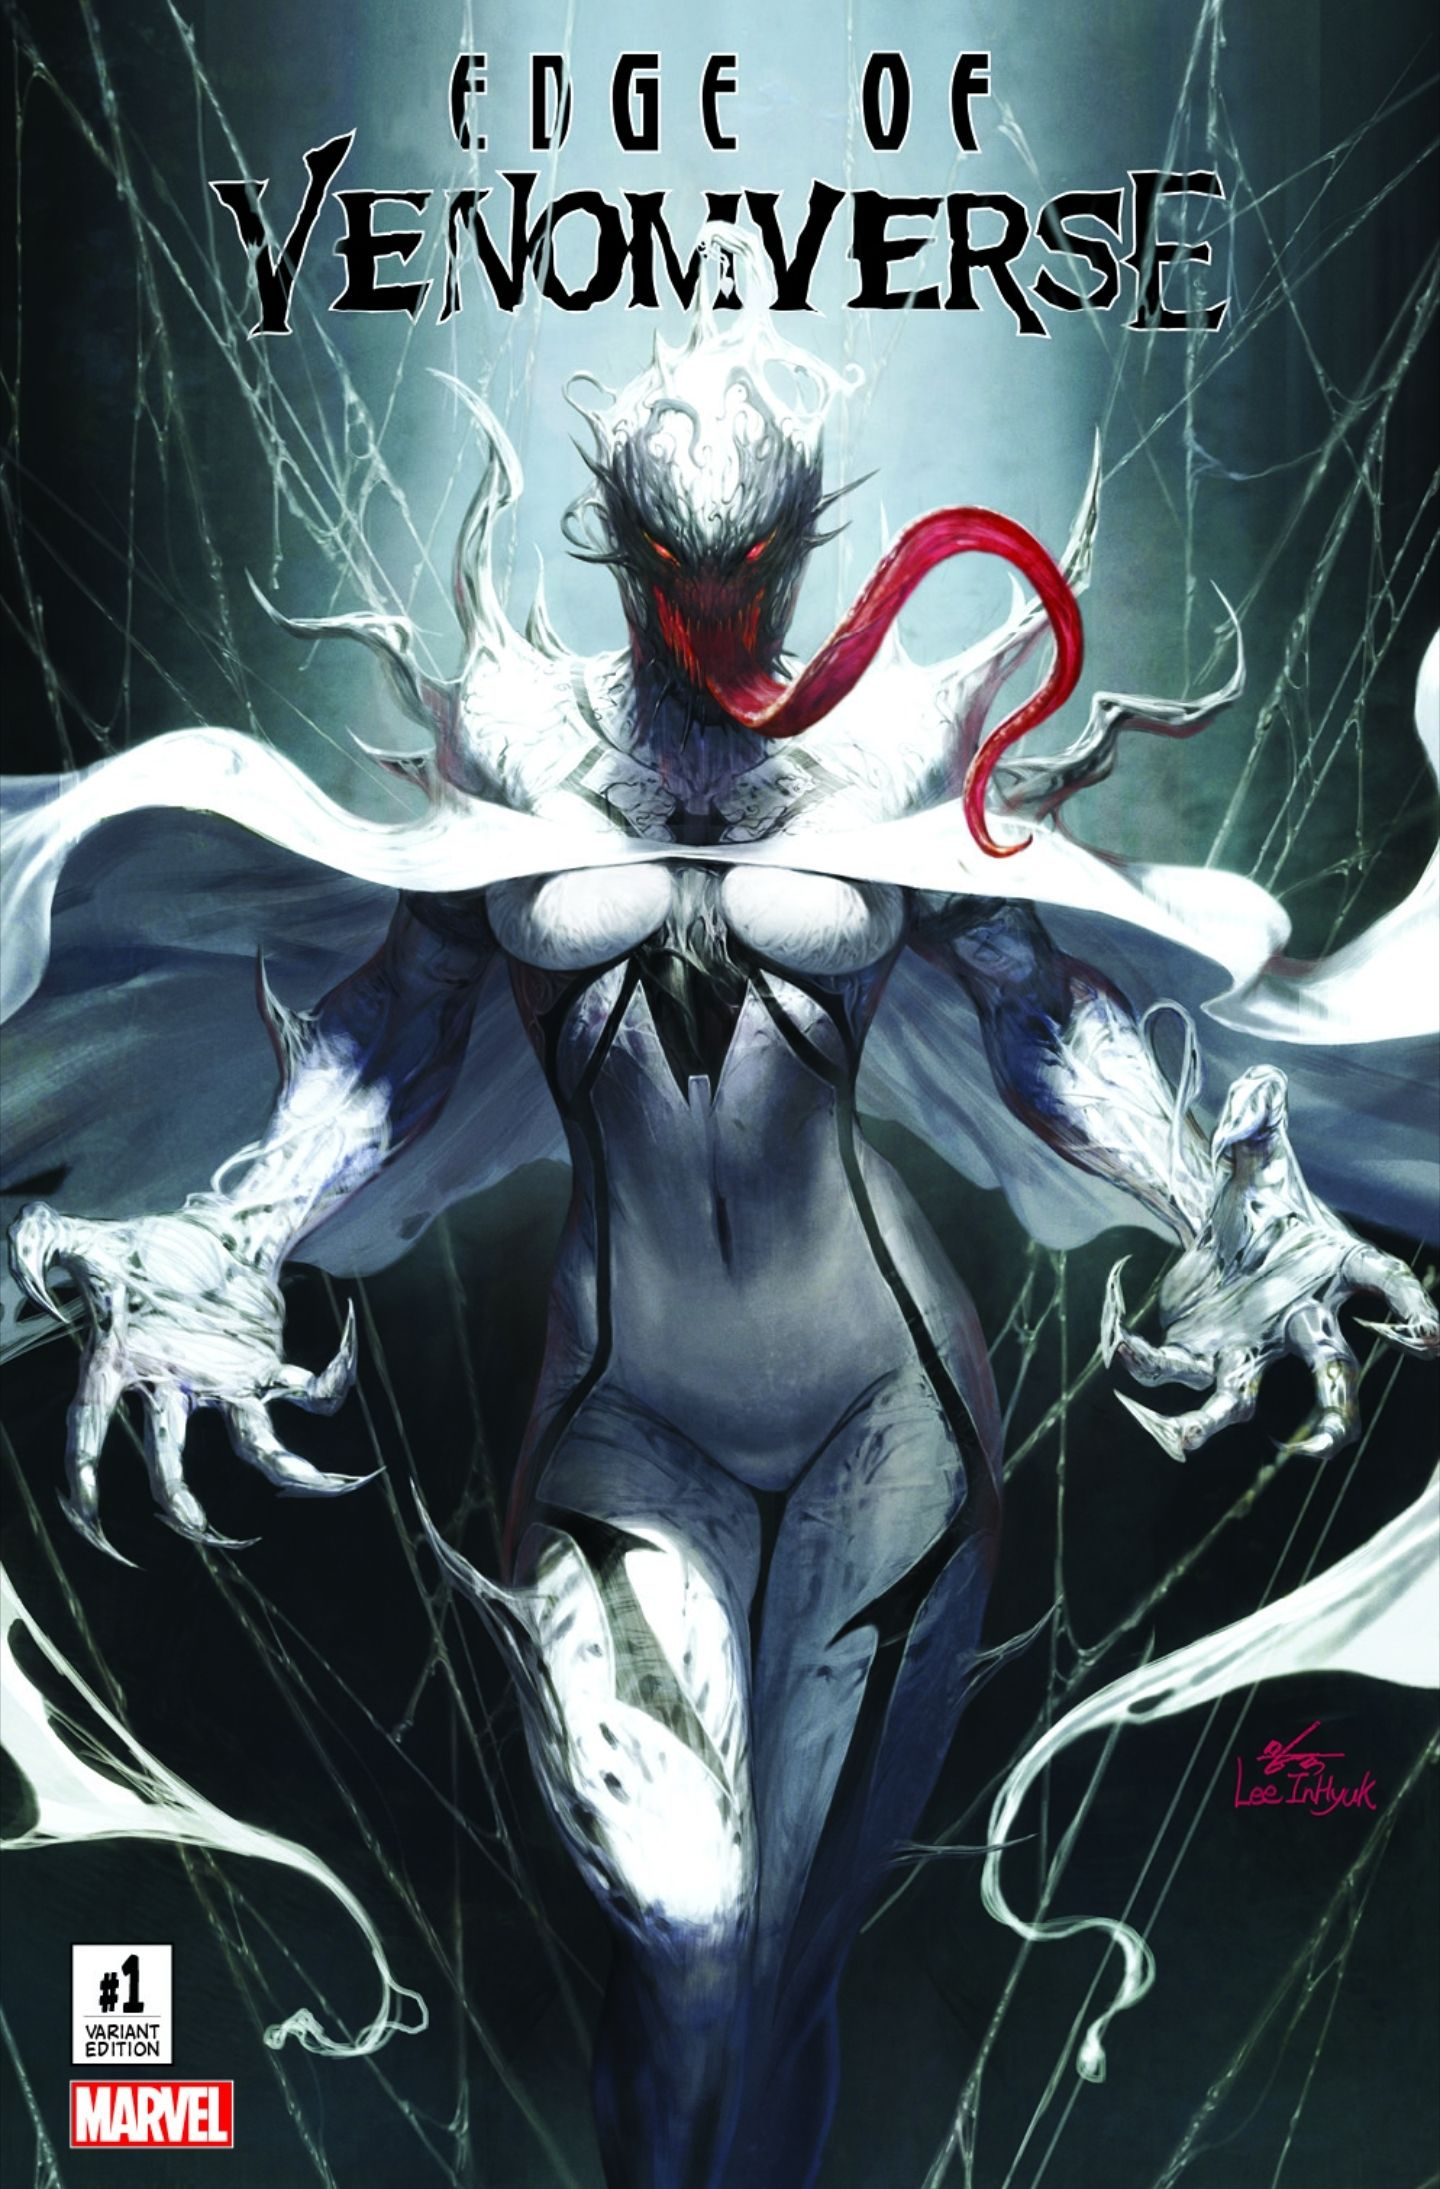 Edge of Venomverse #1 (2017) ComicXposure Exclusive Variant Cover B by InHyuk Lee